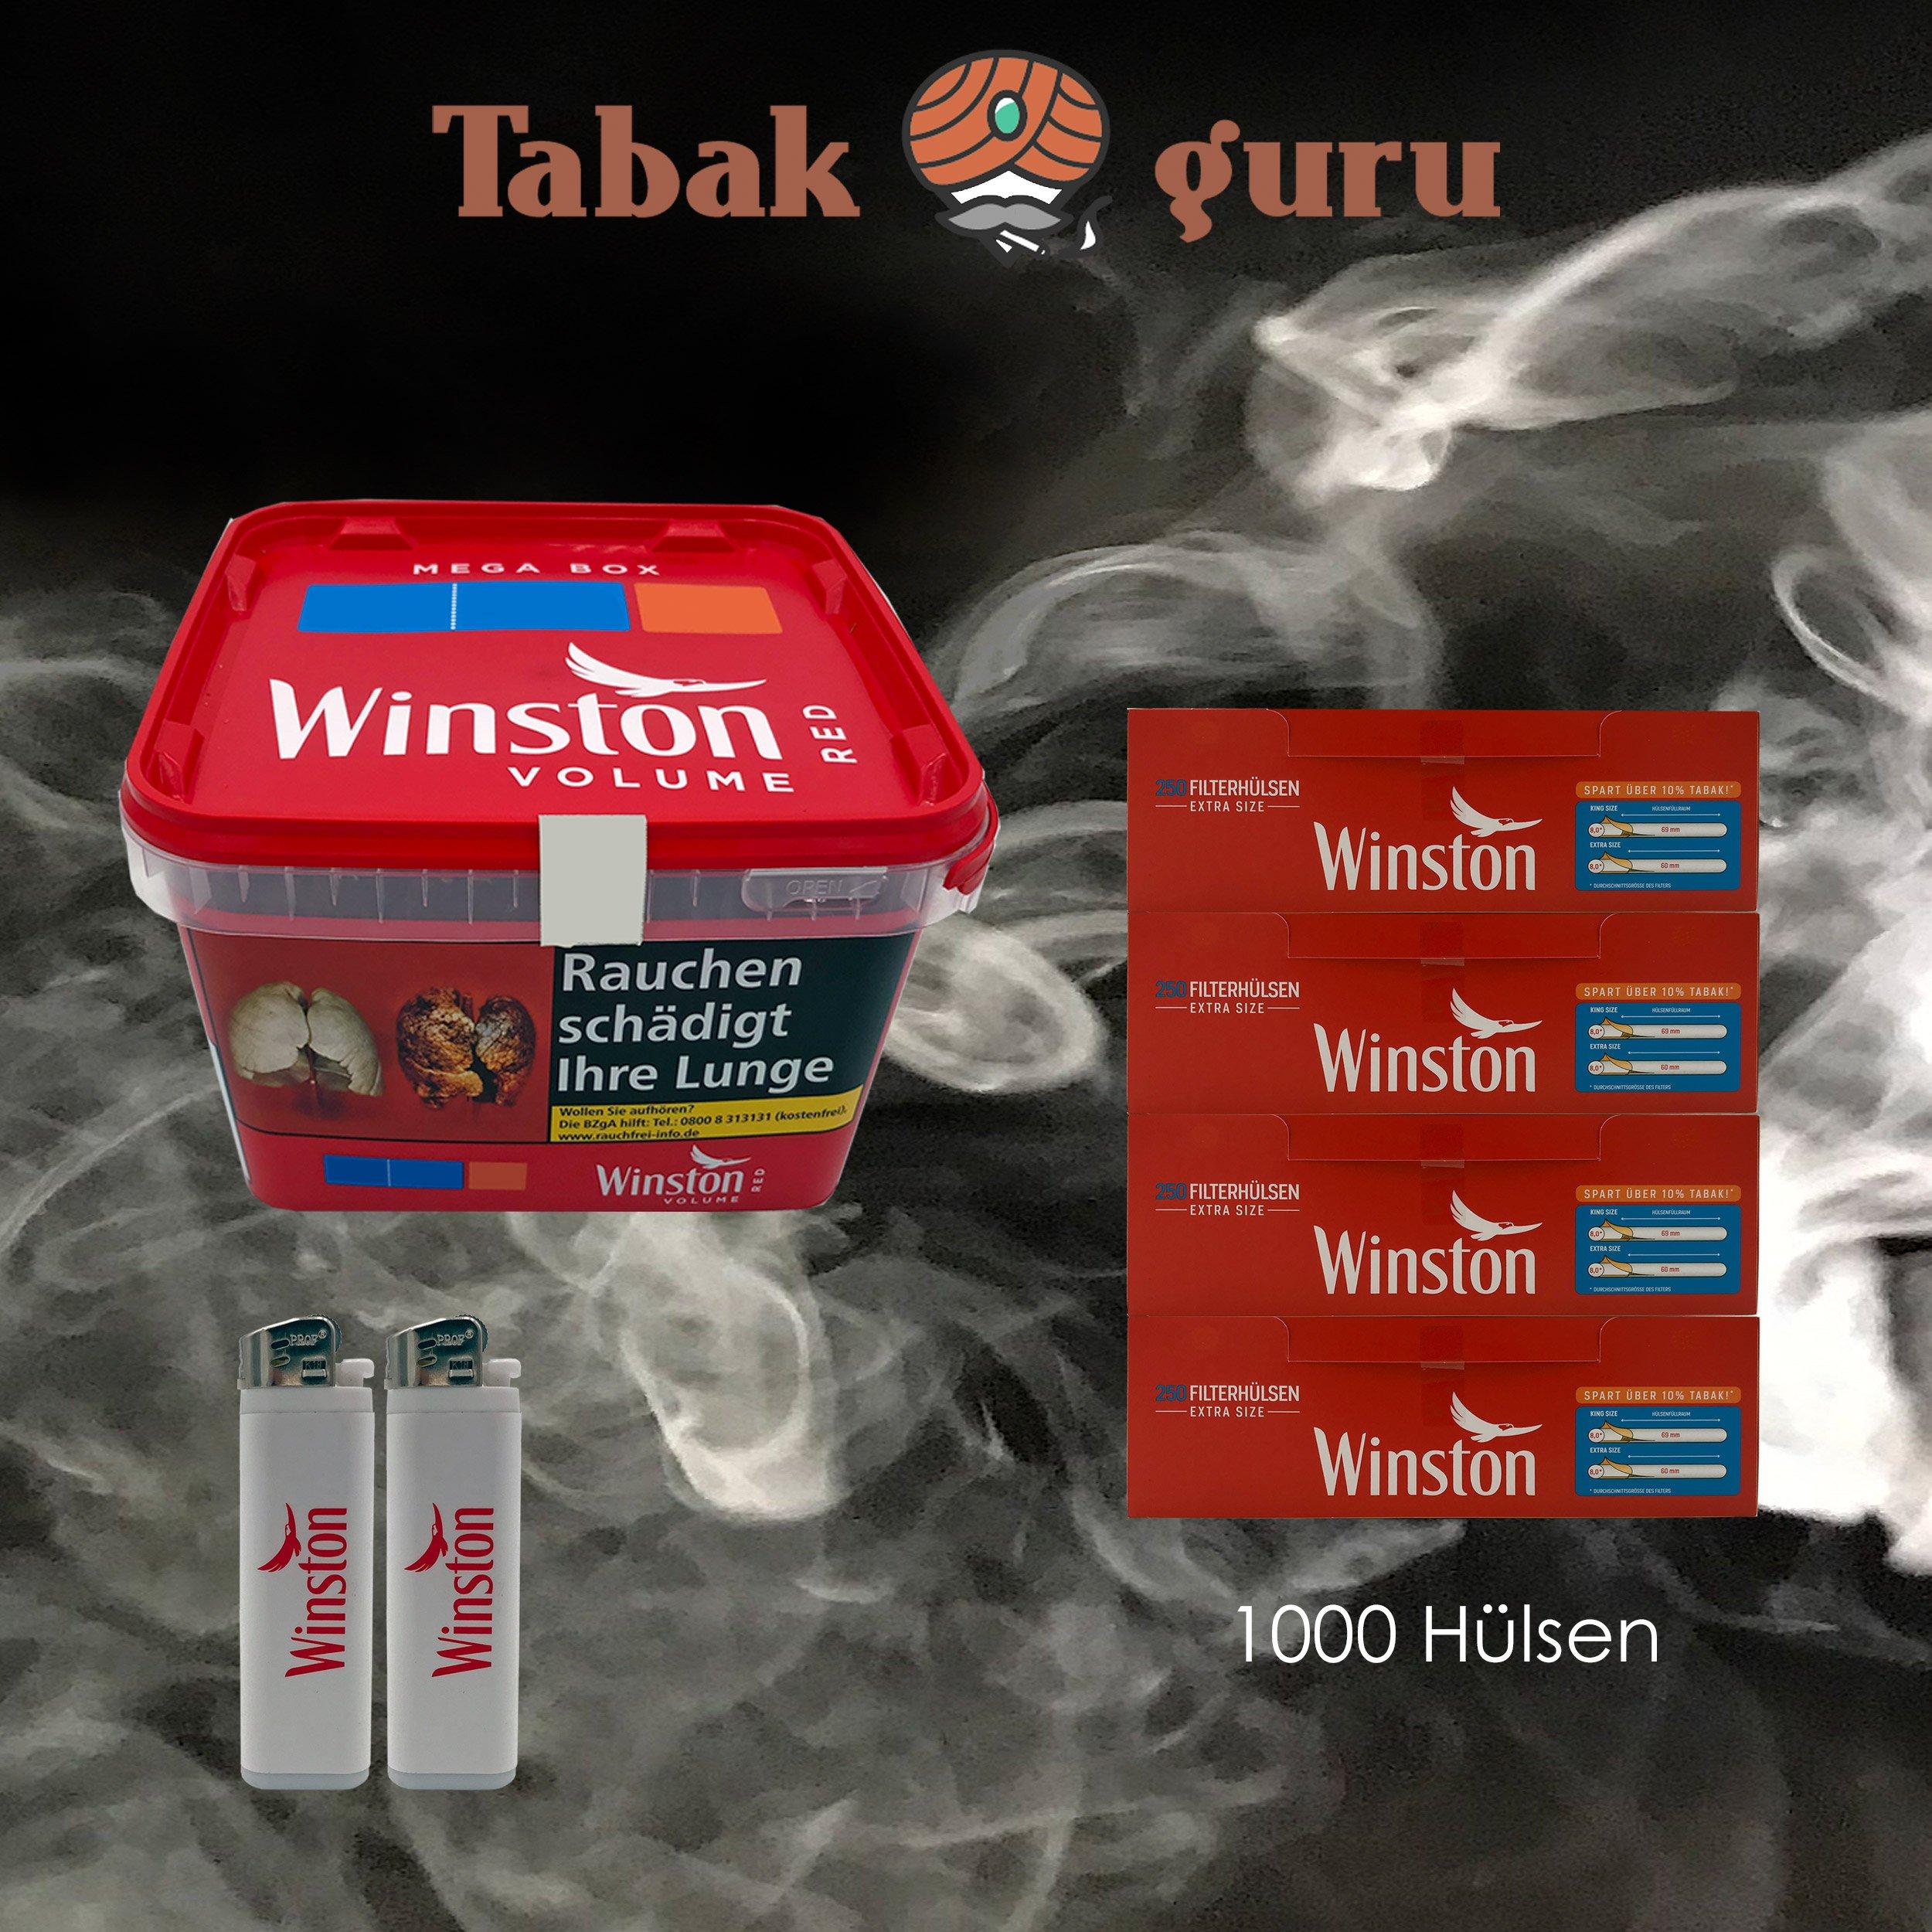 1x Winston Classic Red / Rot Mega Box 170g Volumentabak, 1000 Winston Extra Hülsen